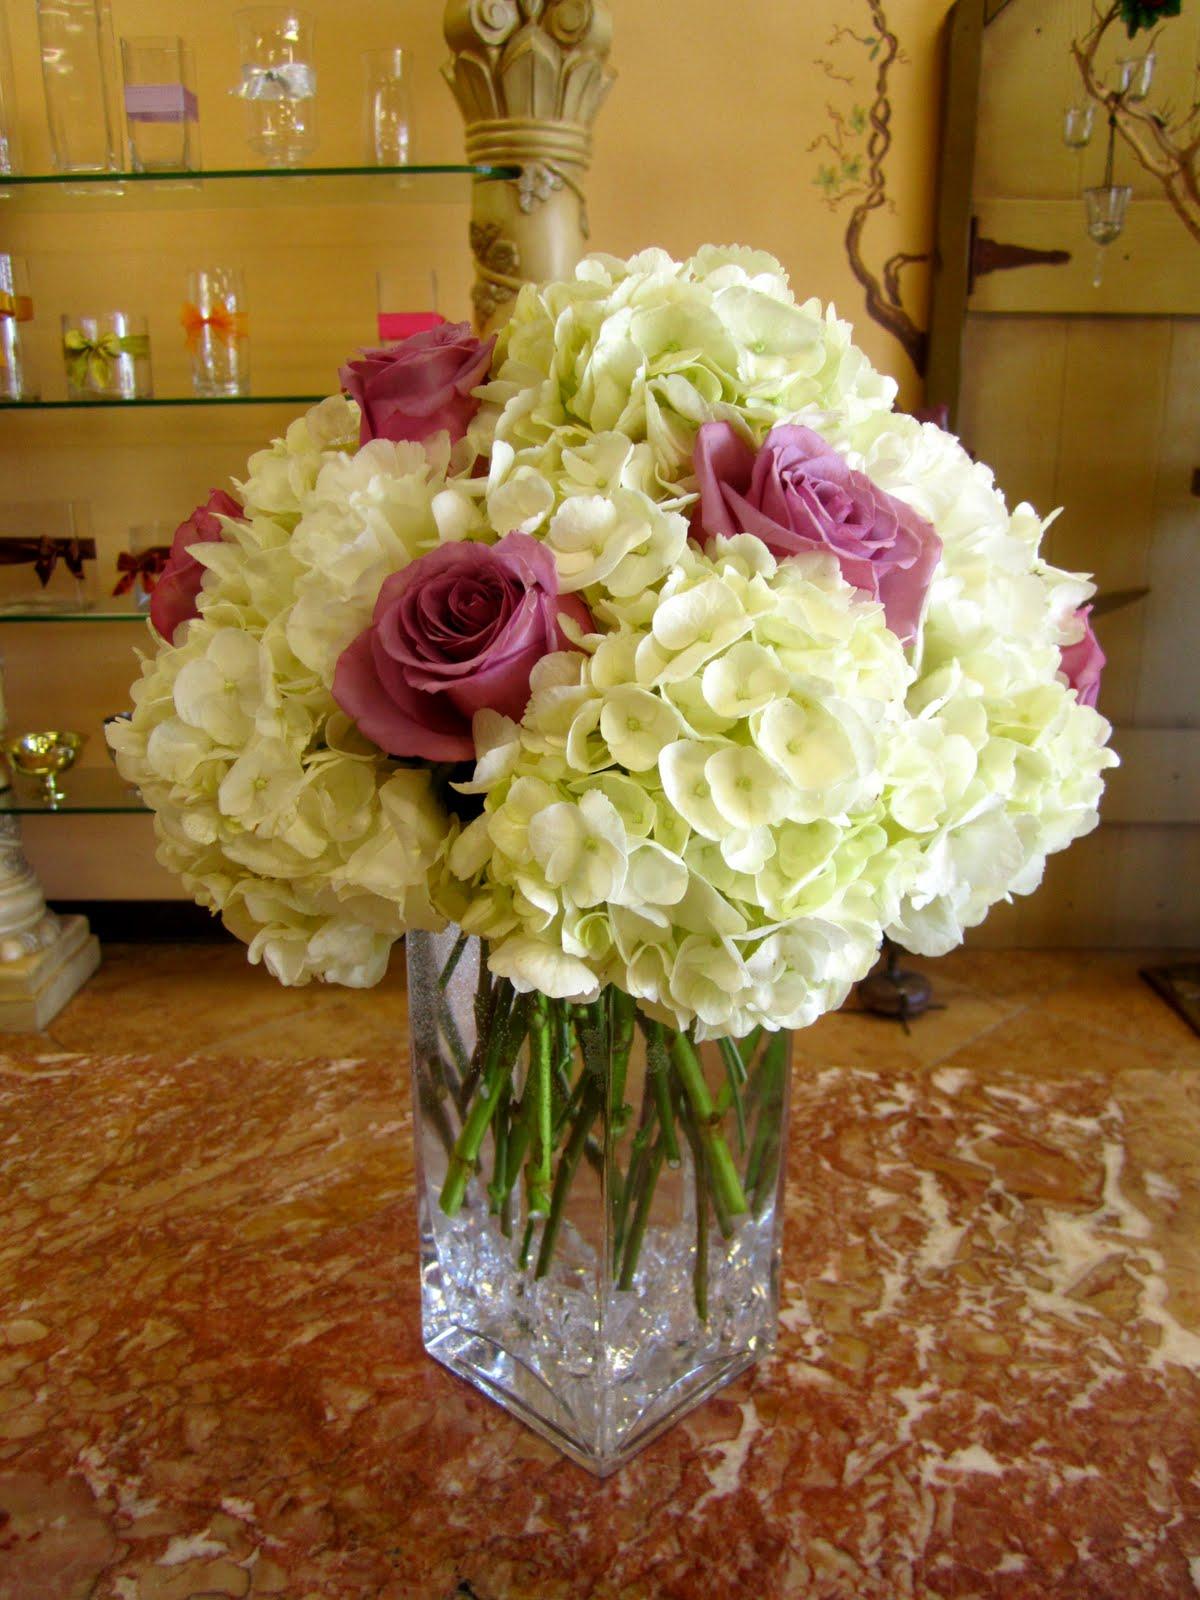 Hydrangea Centerpieces In Square Vases : Bernardo s flowers rose hydrangea square glass vase arr